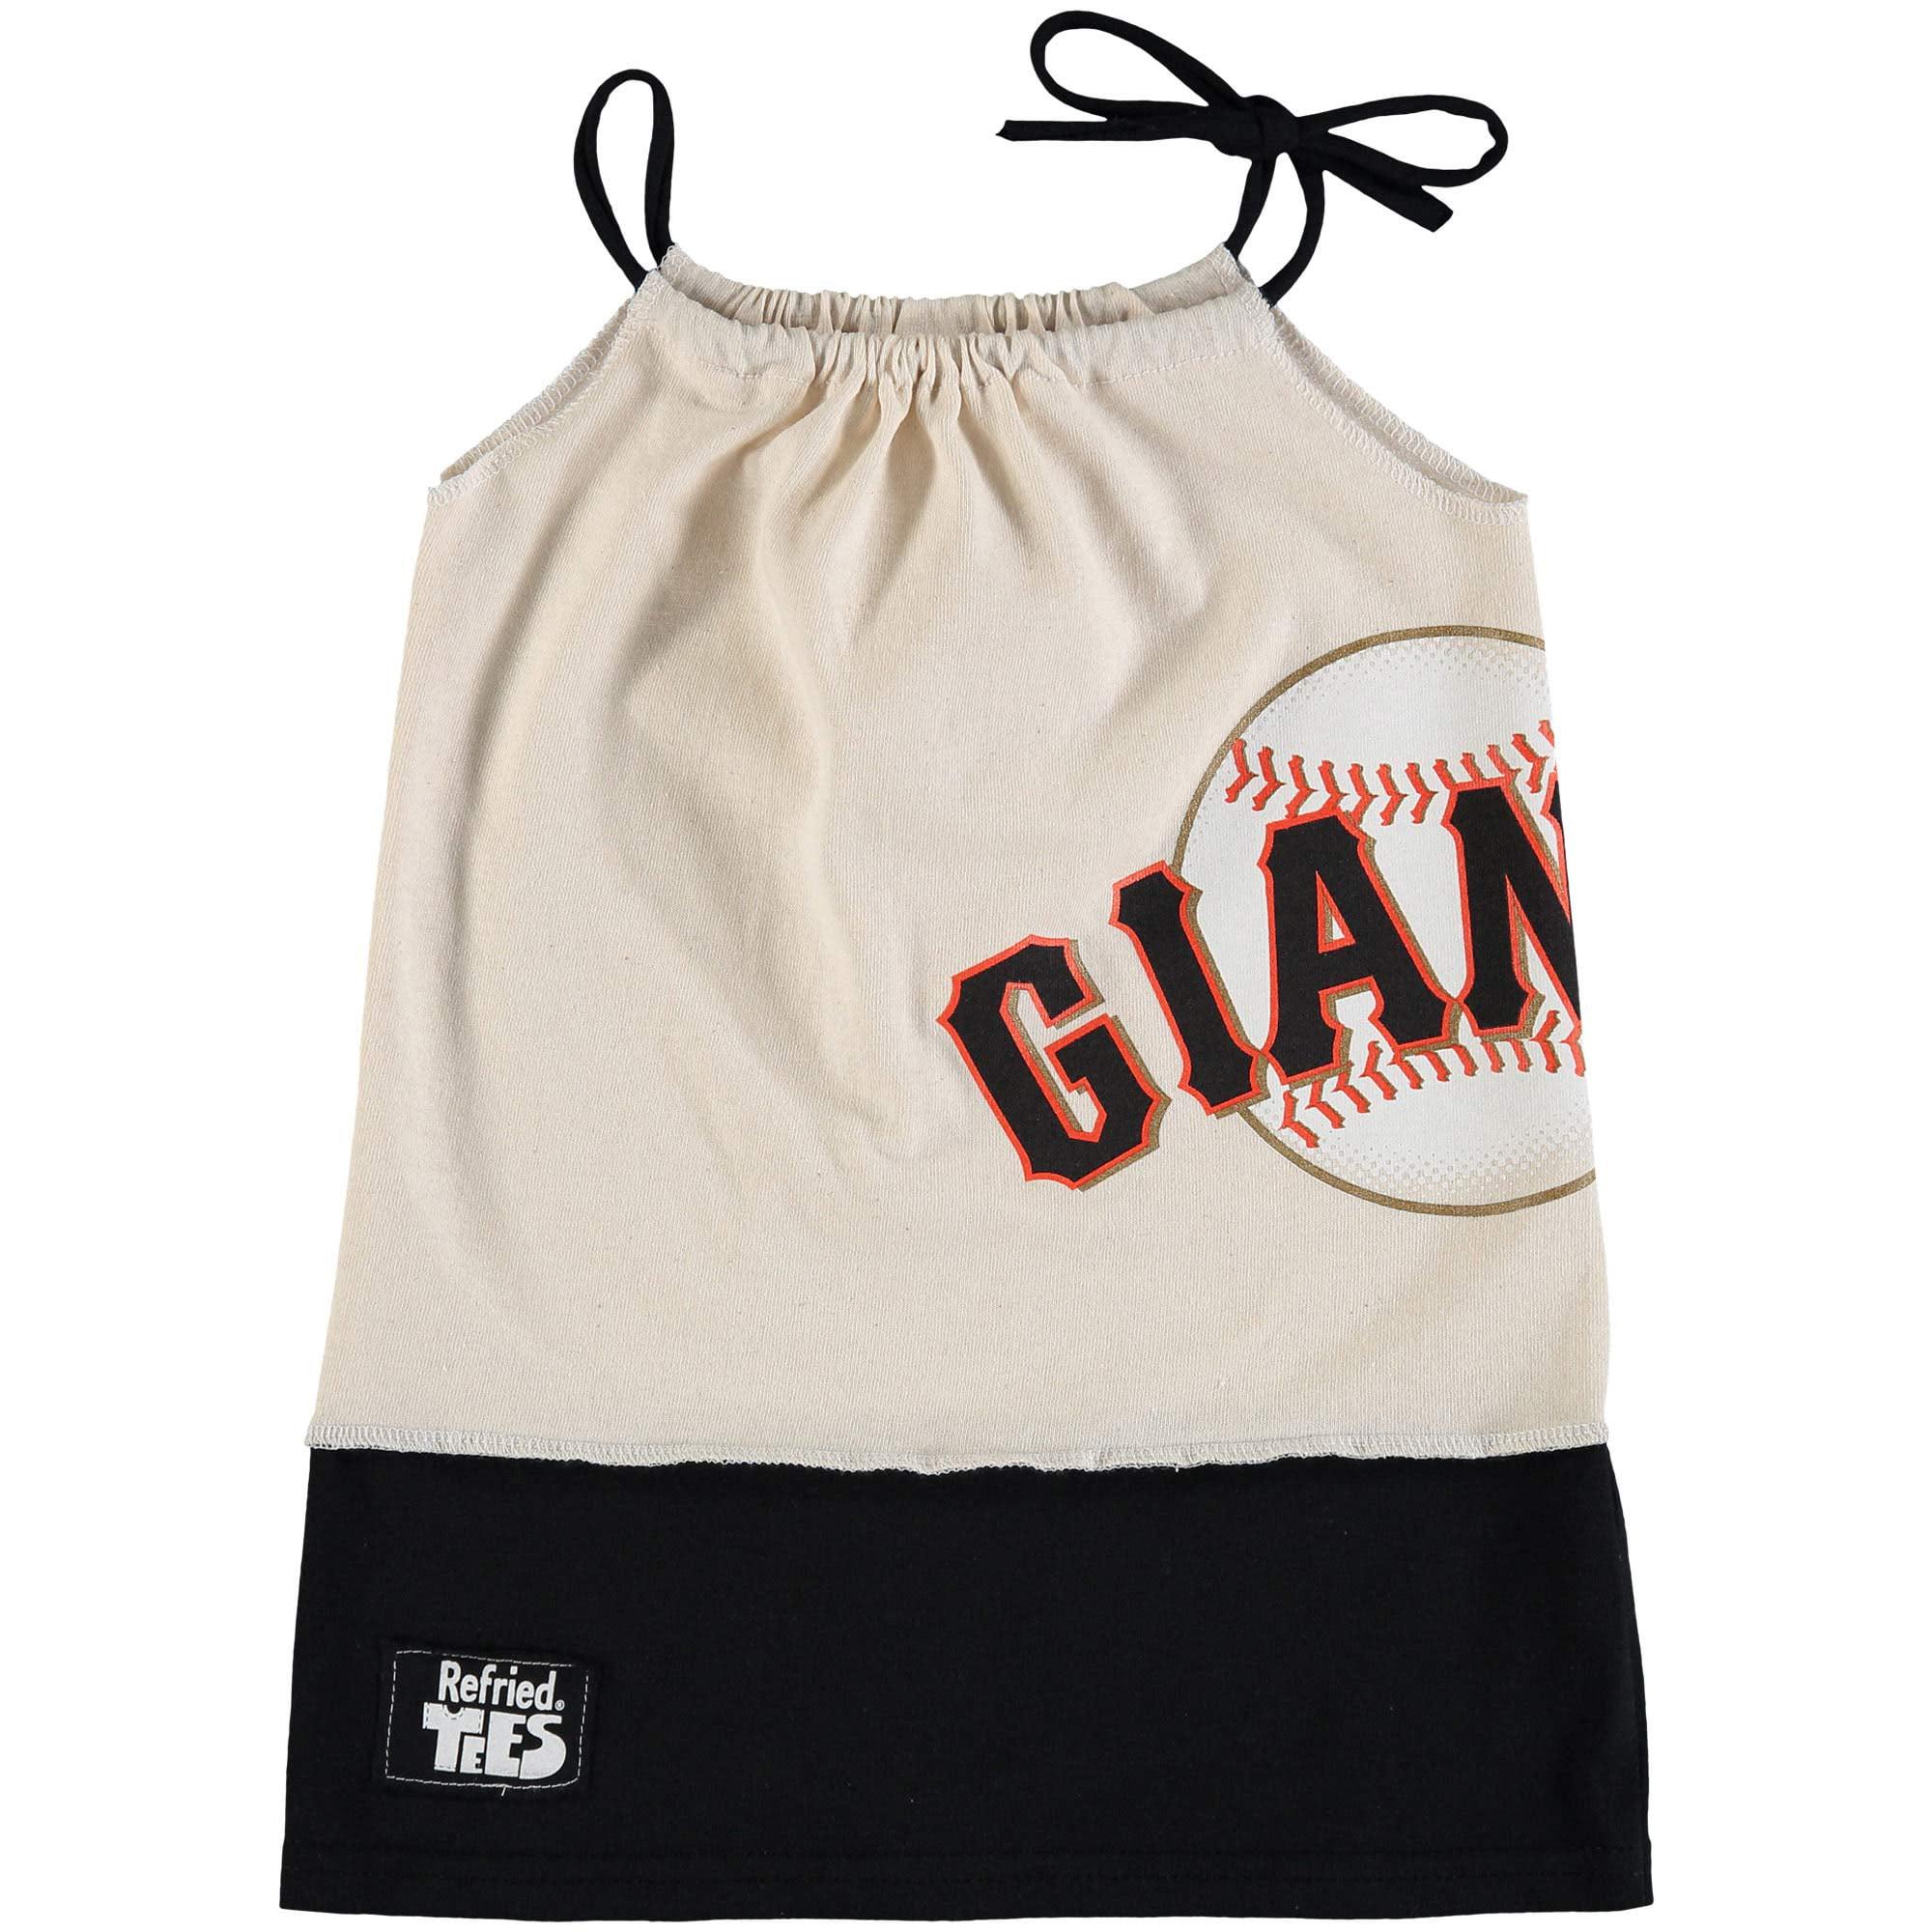 San Francisco Giants Refried Tees Girls Toddler Tee-Tank Dress - Cream